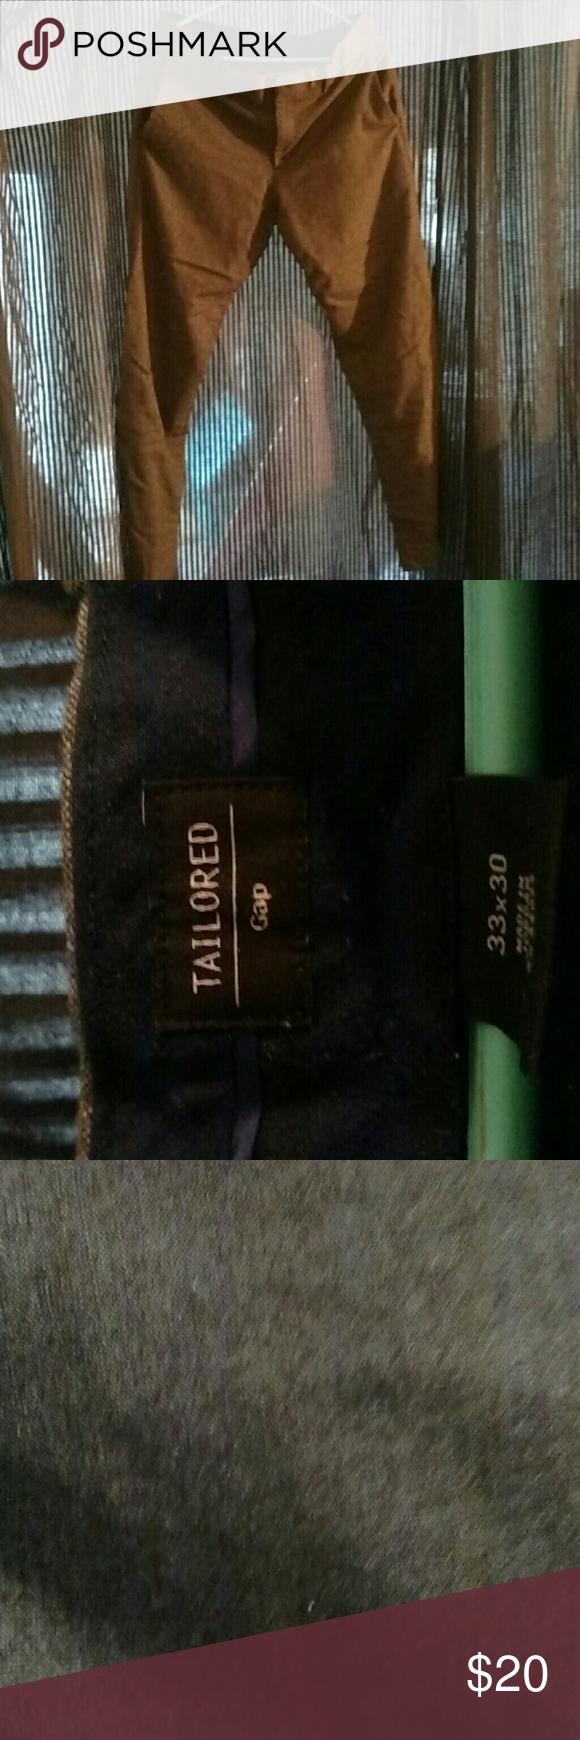 Wool slacks Grey slim fitting wool dress slacks Gap tailored   Pants Trousers